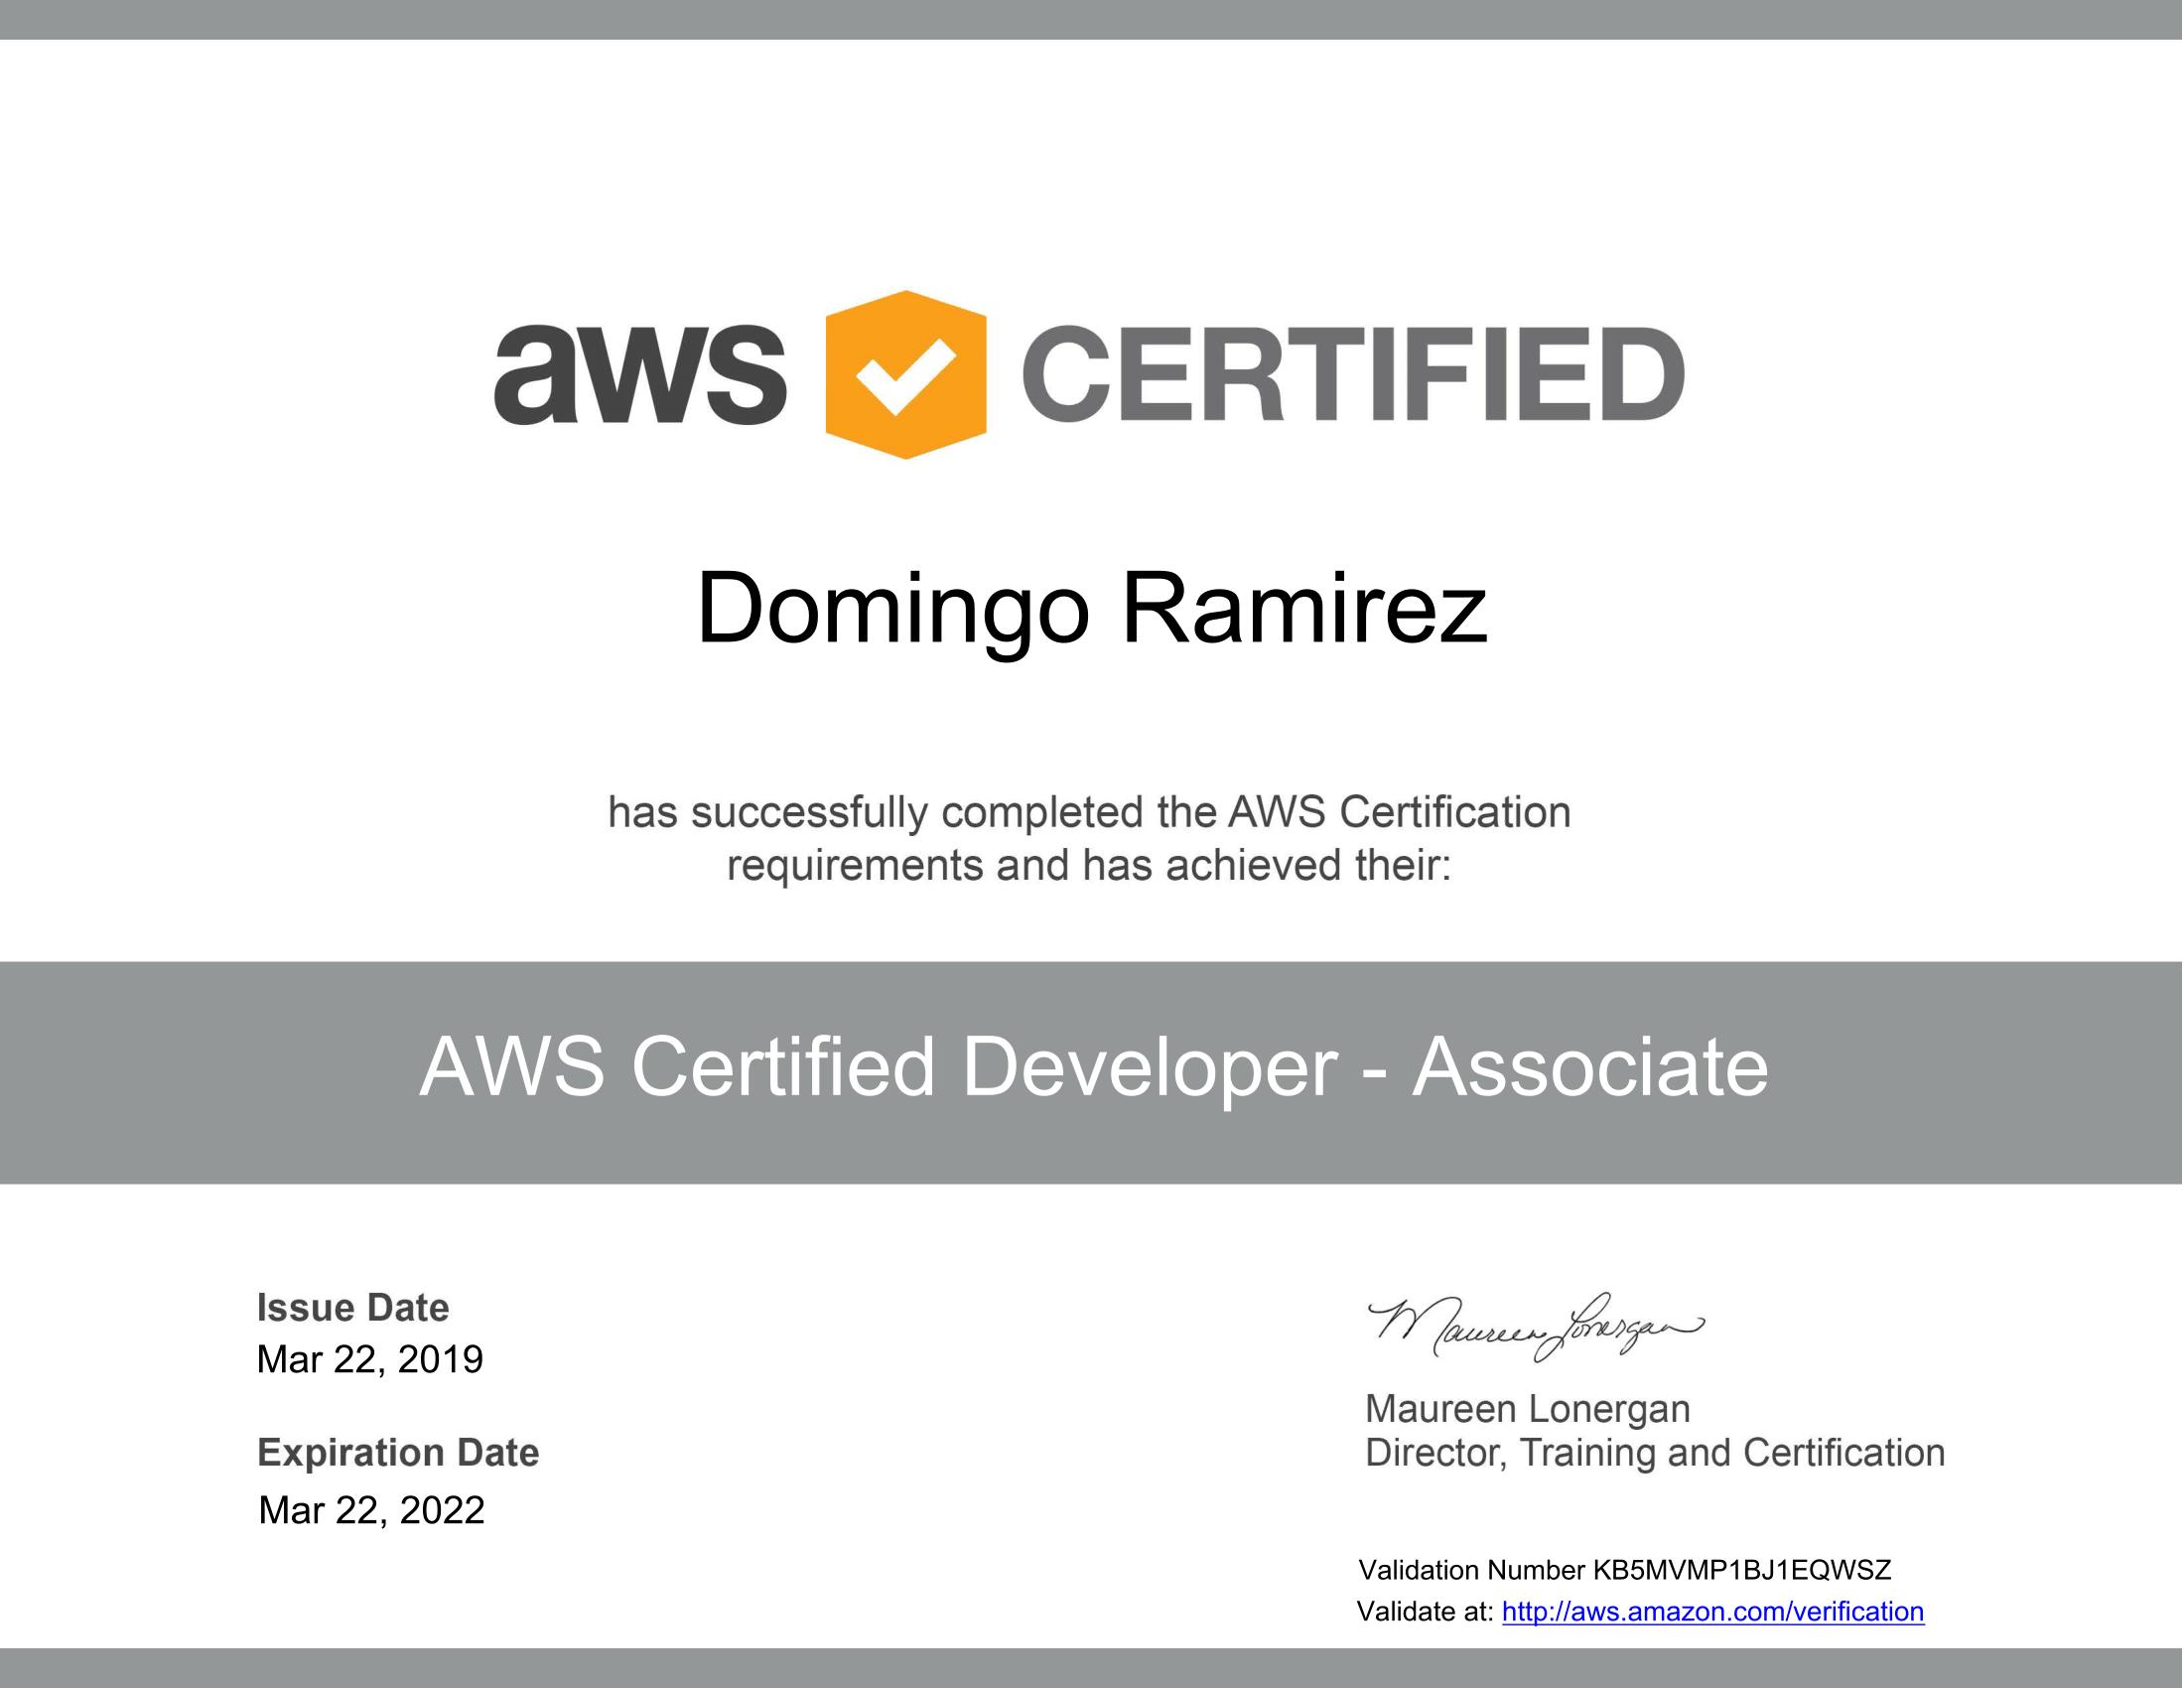 AWS Certified Developer - Associate certificate-1